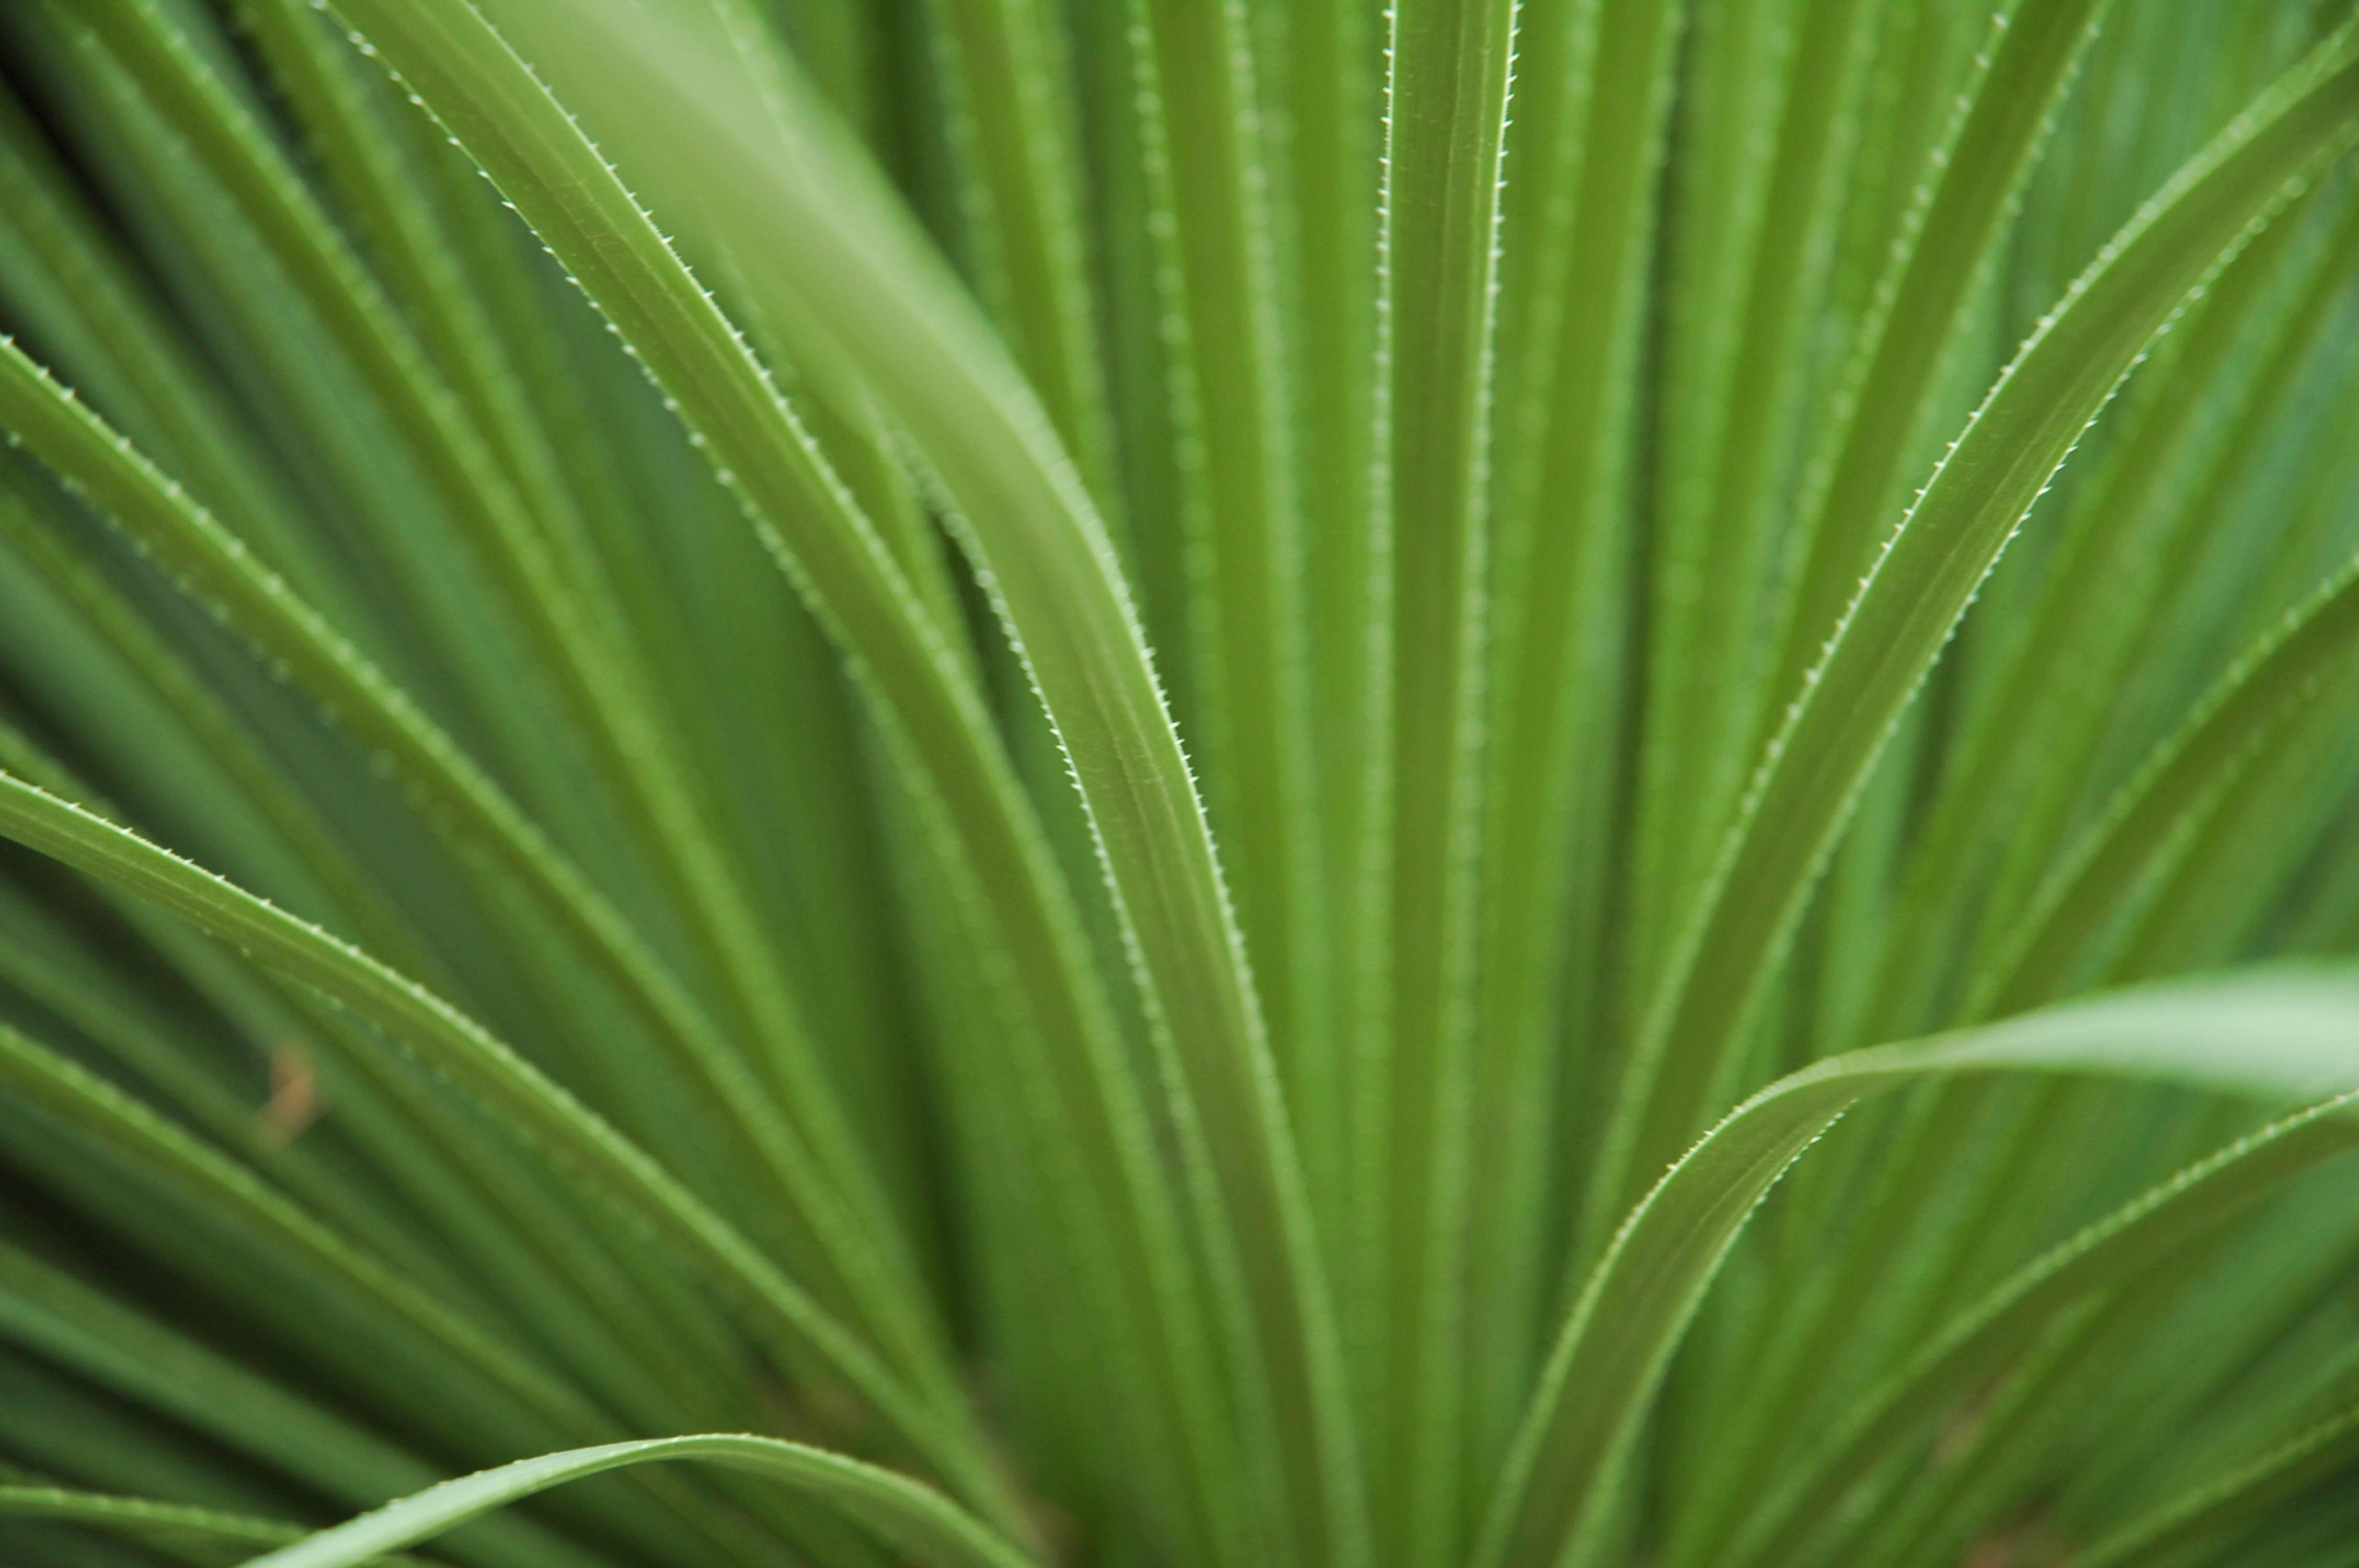 Botanic Garden Cactus Leaves Texture